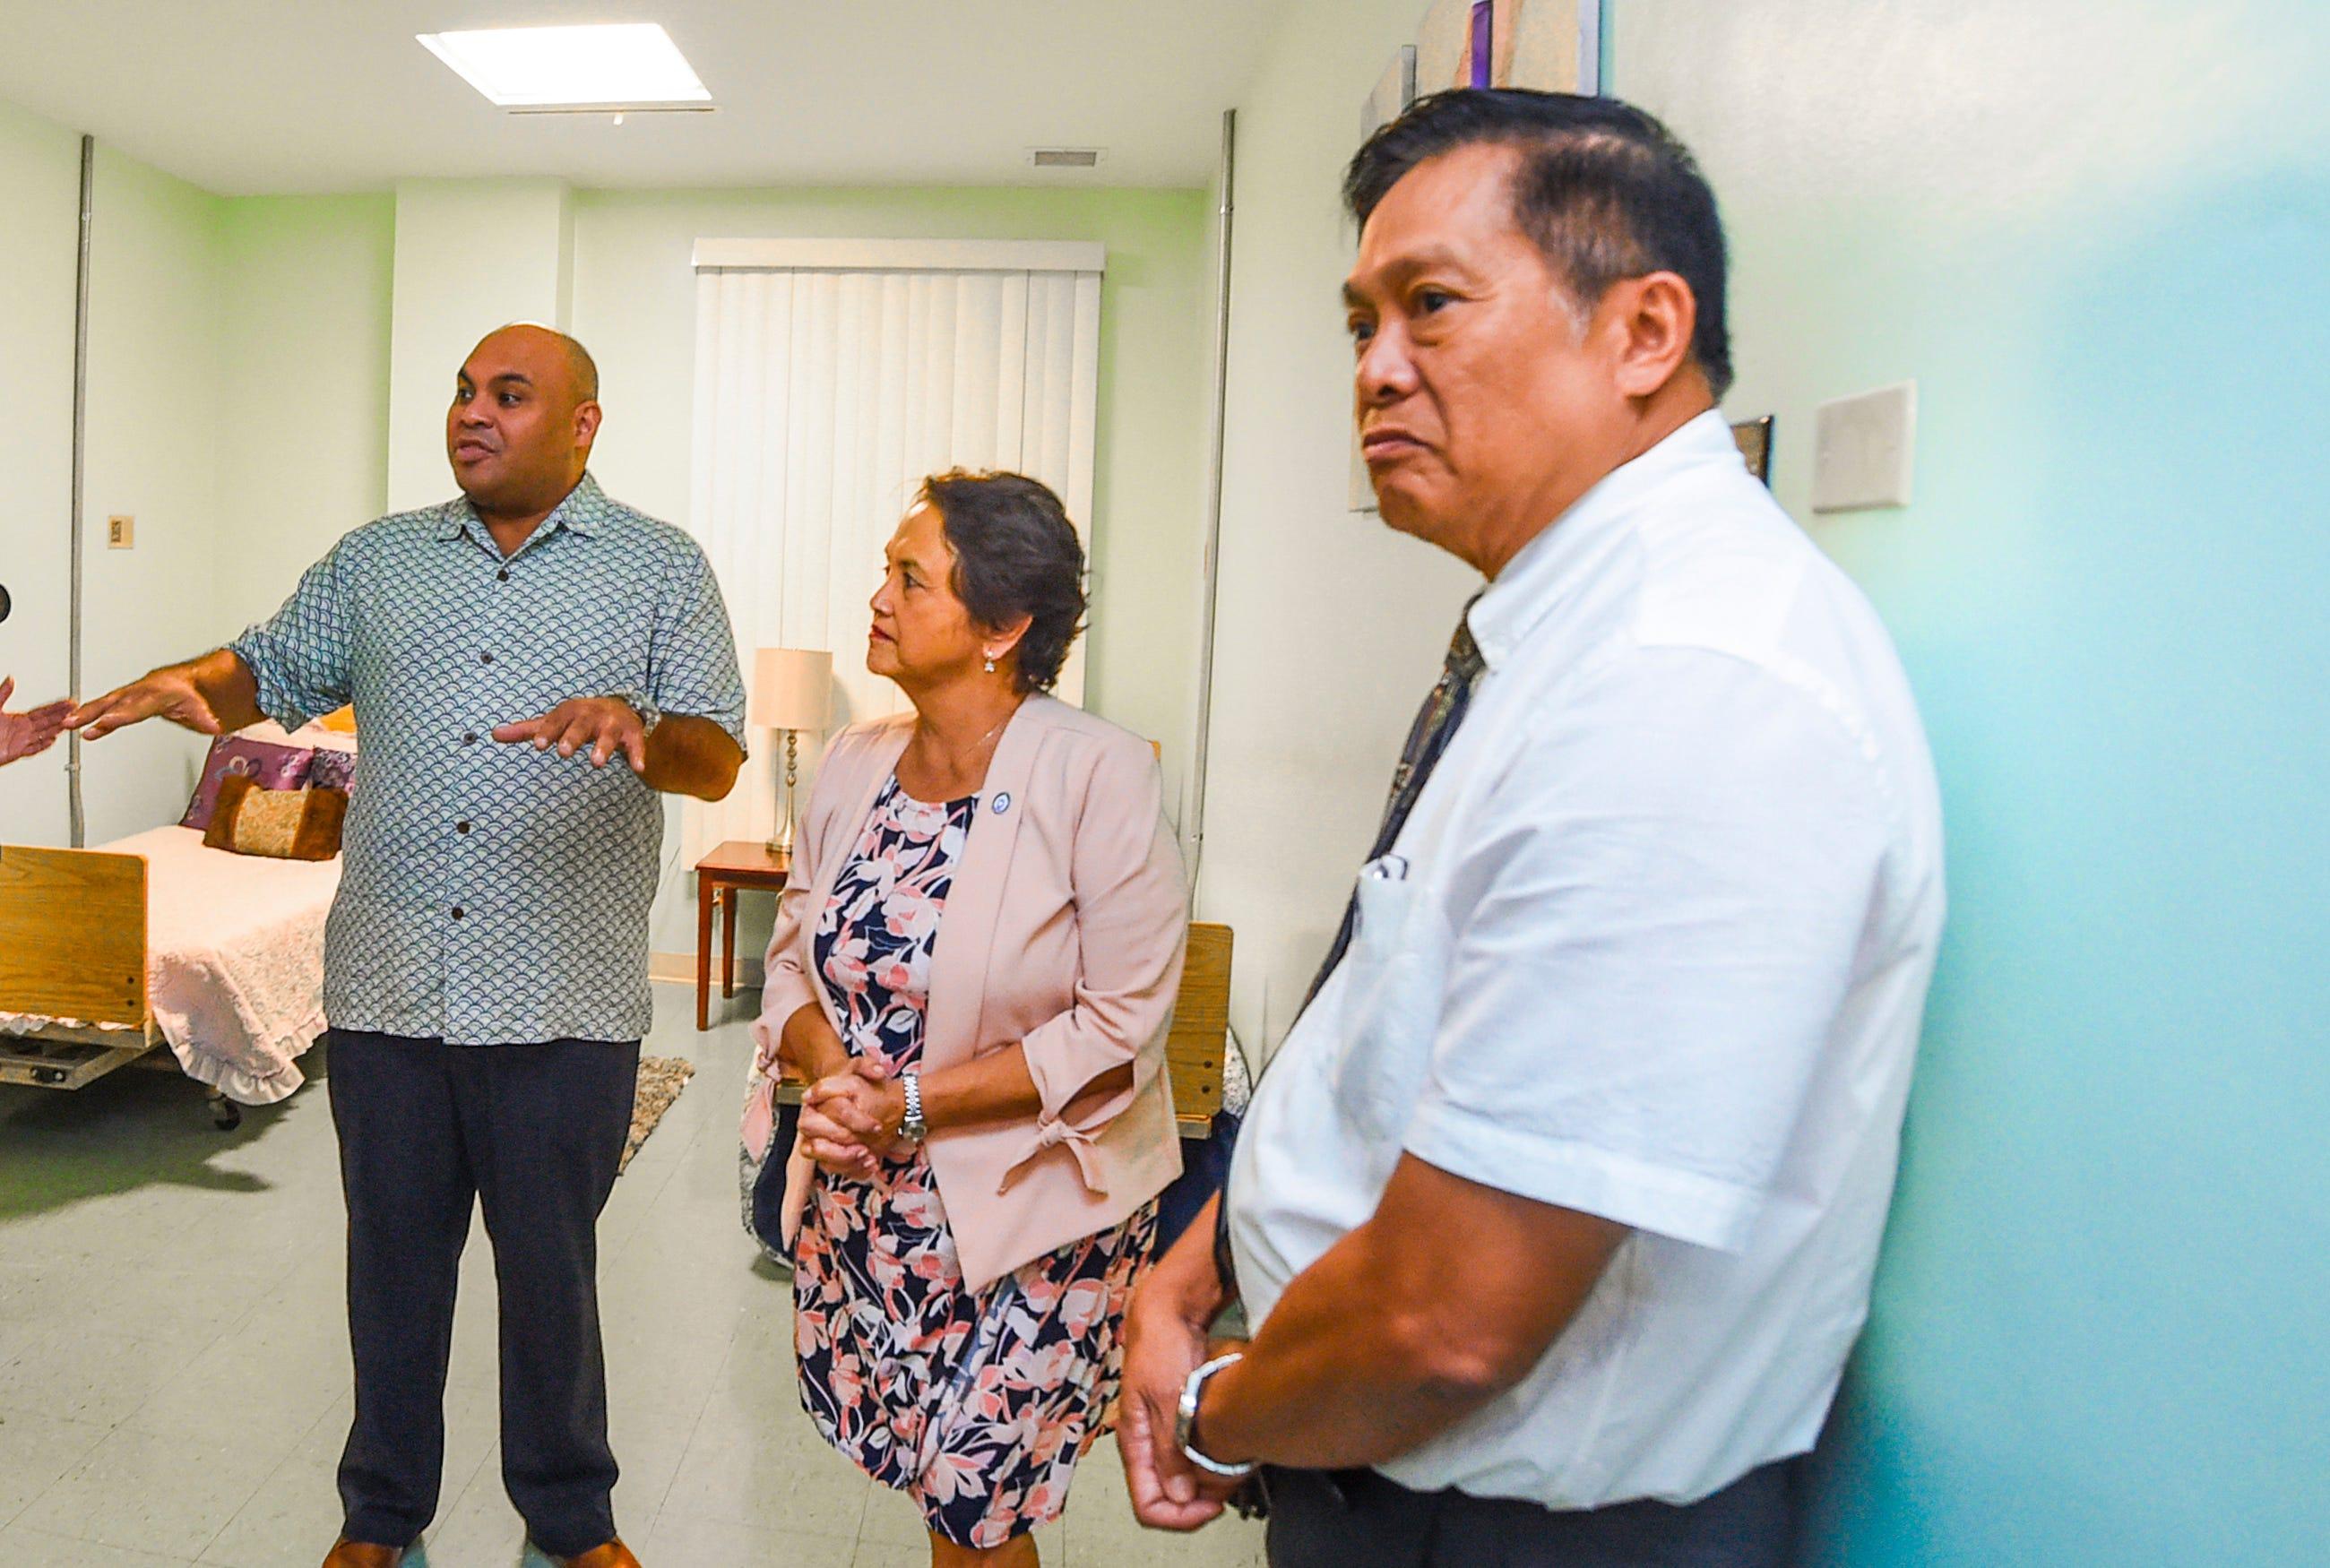 Investigation of former GovGuam psychiatrist Abner Pasatiempo stalled